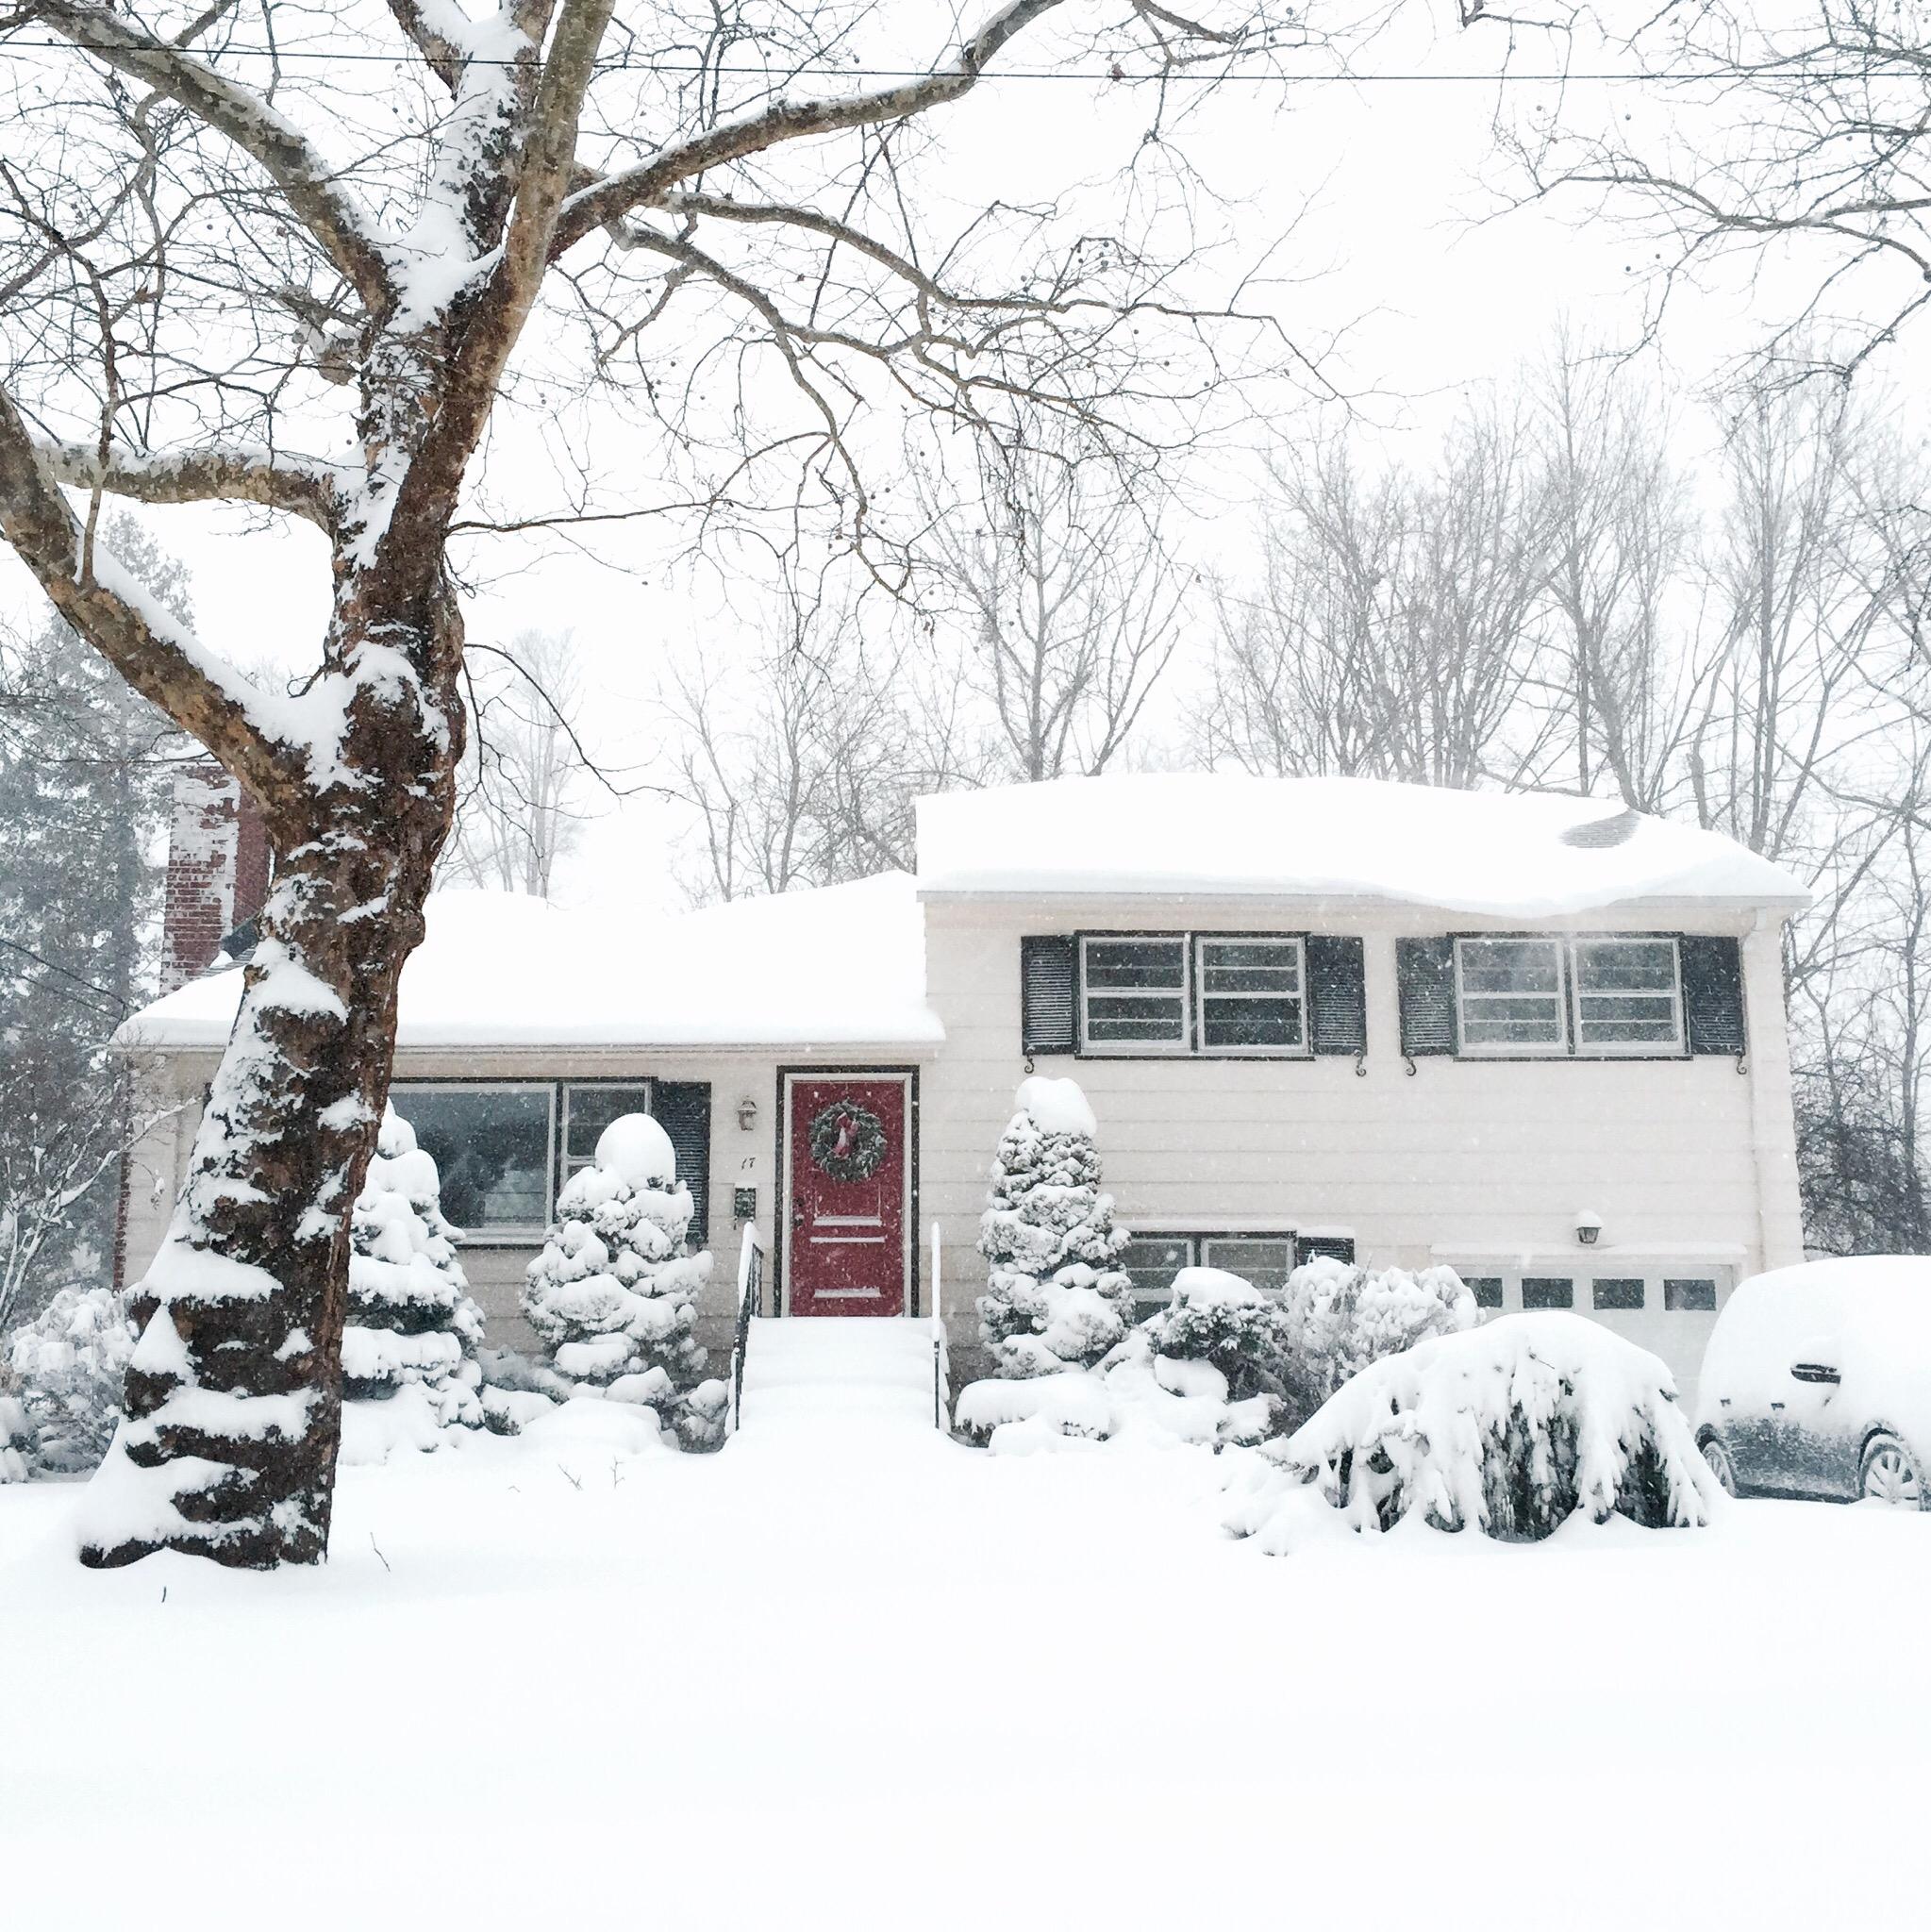 snowy home.jpeg